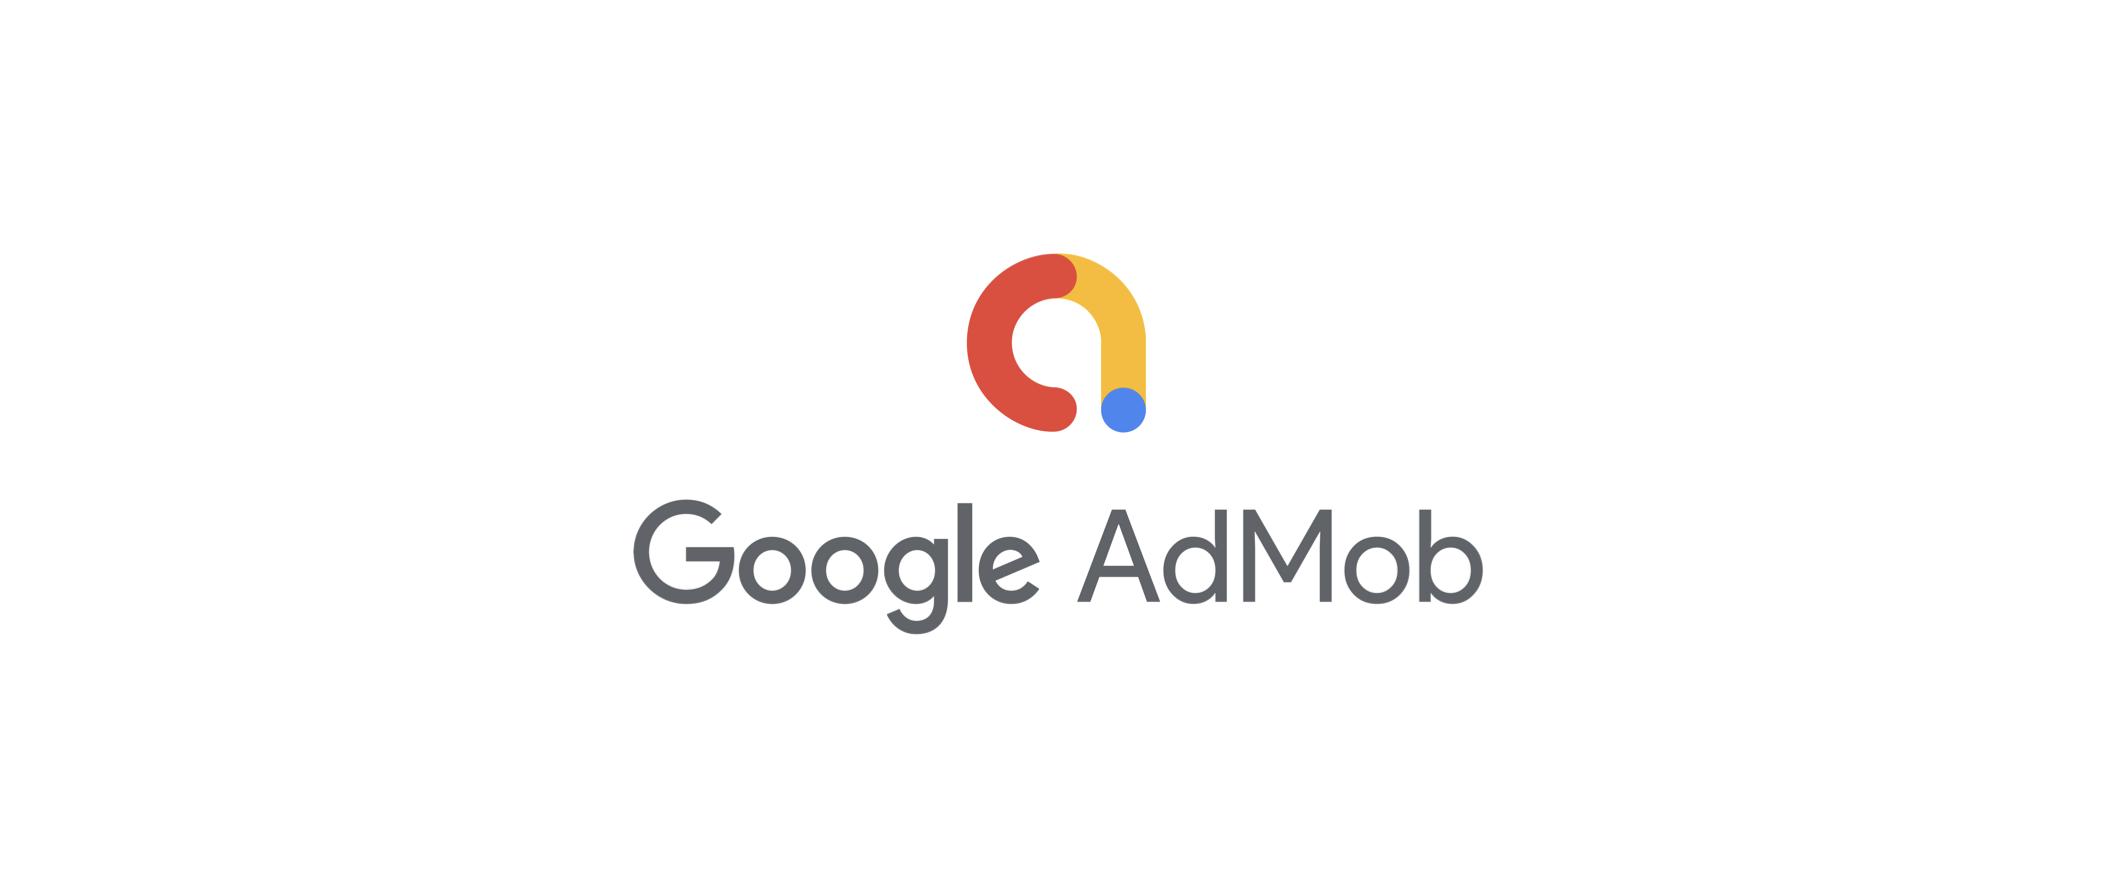 Google Admob Nedir